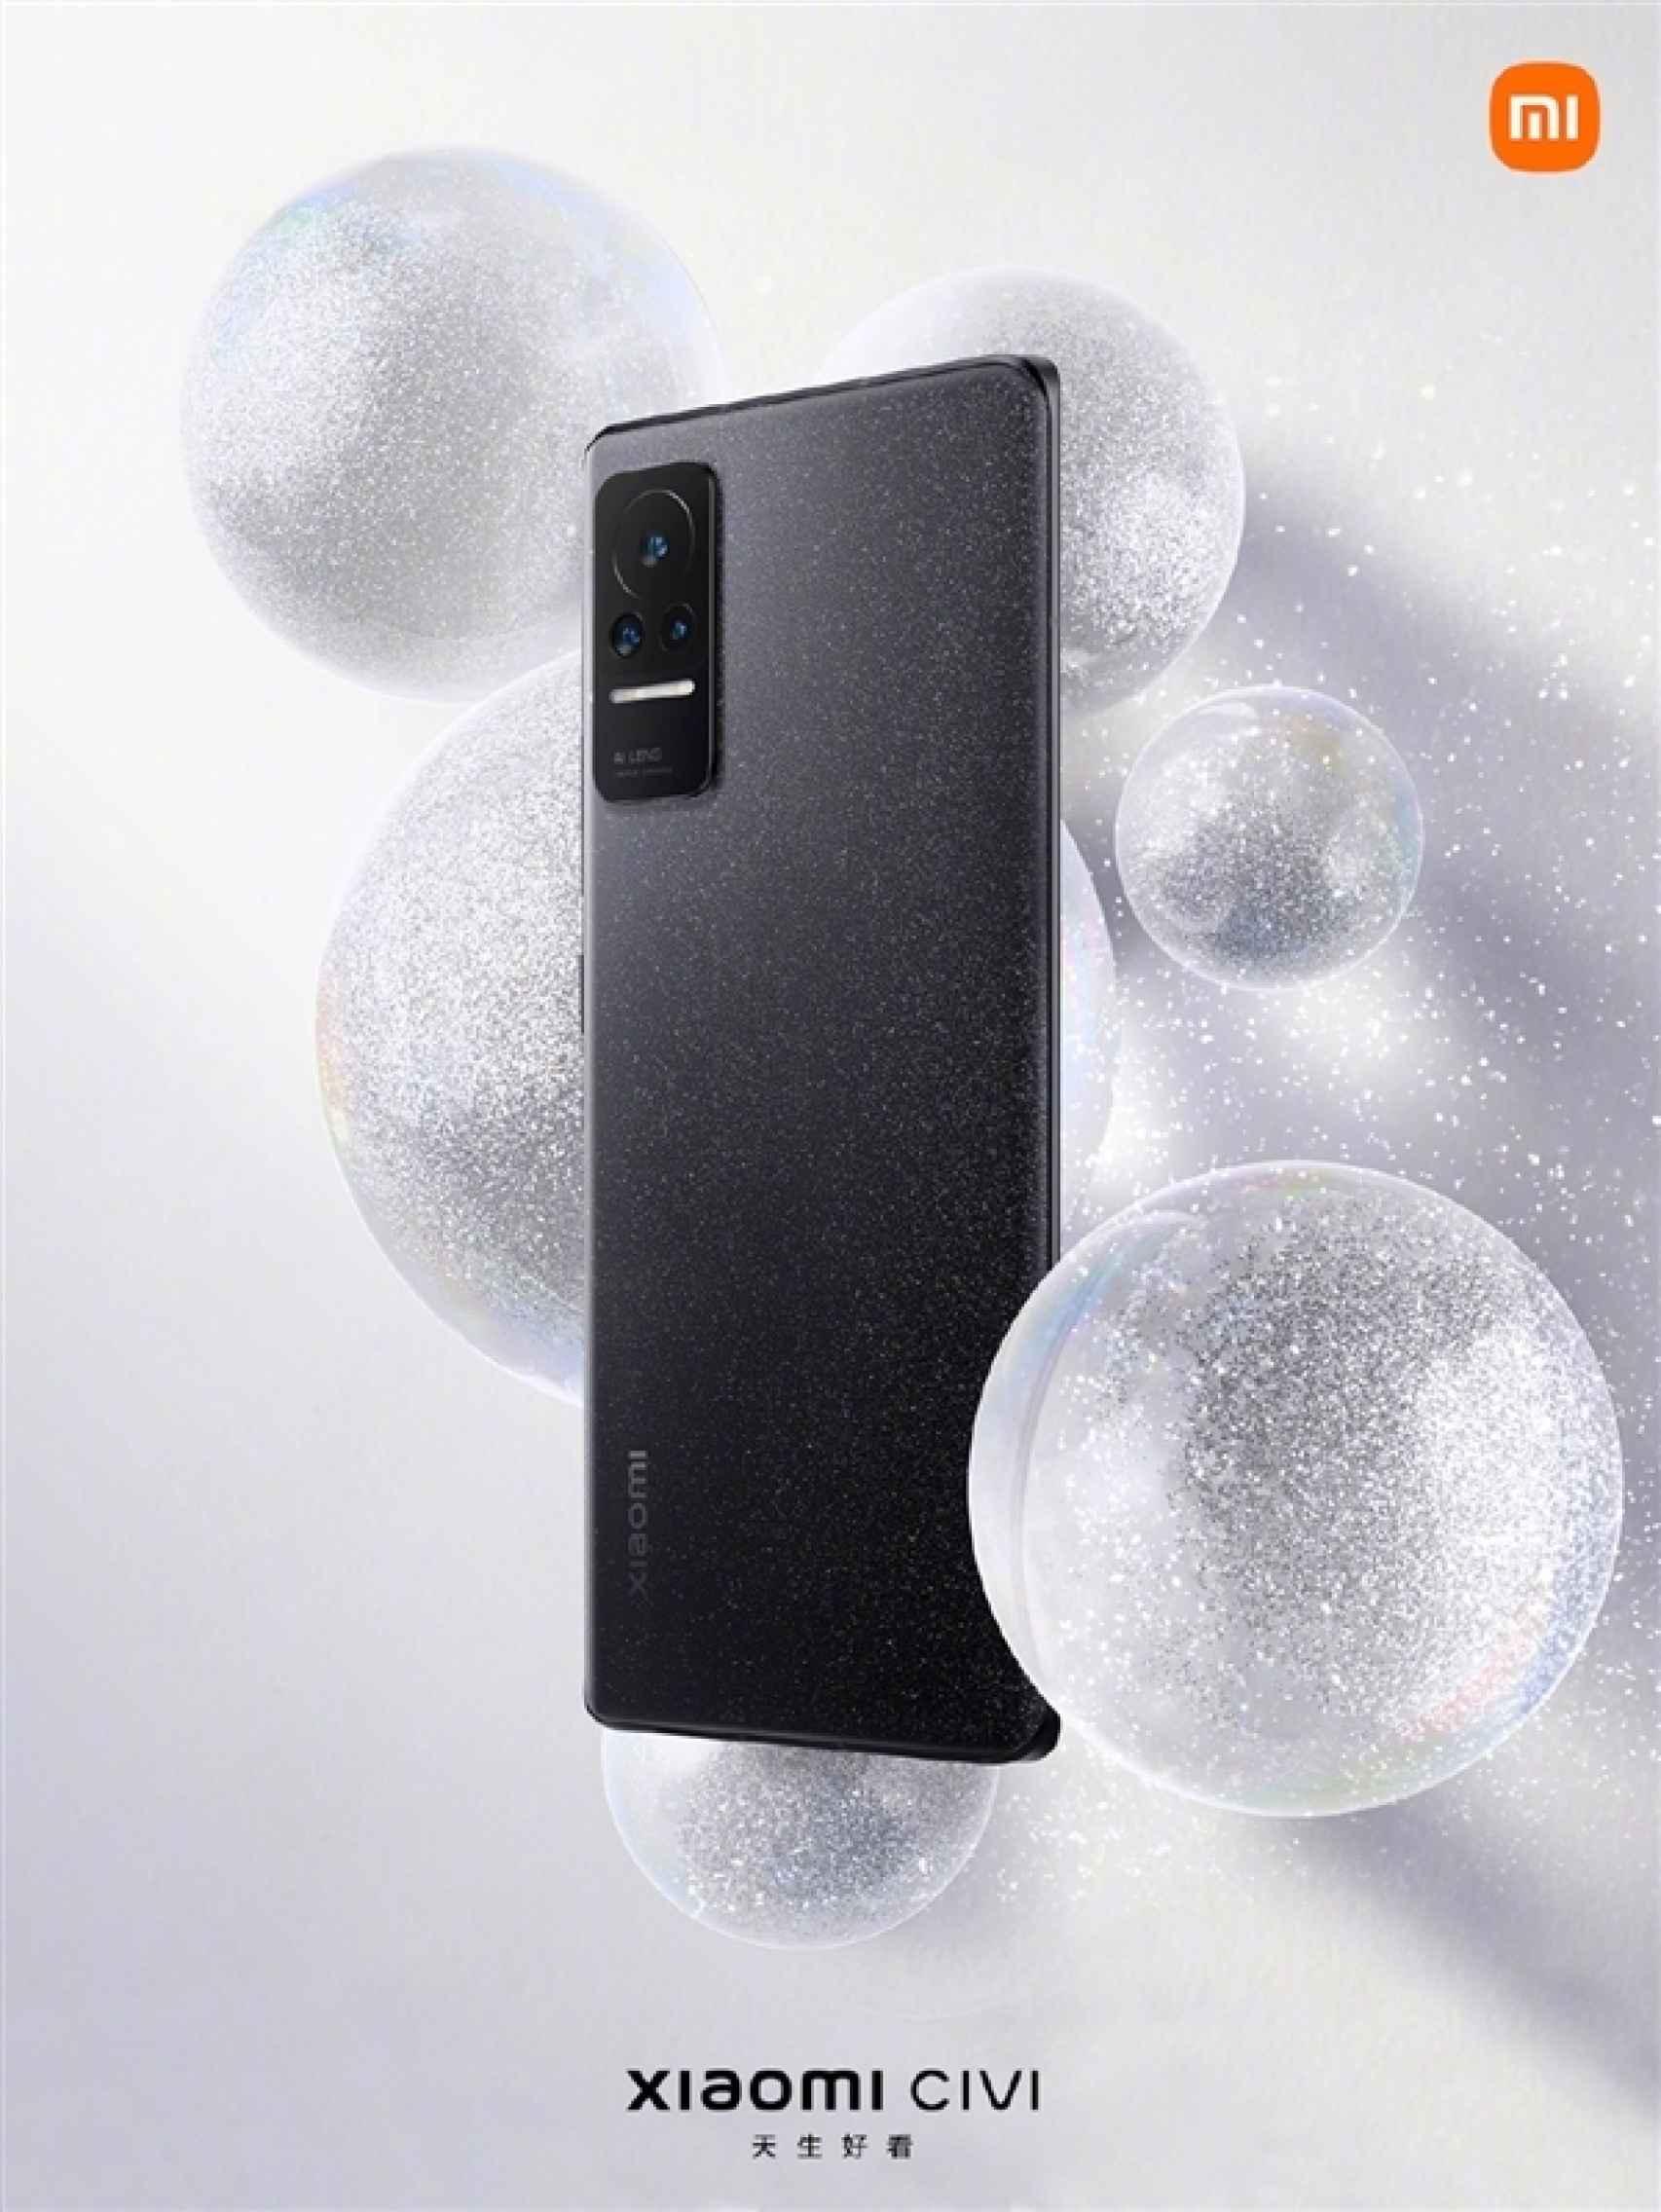 Xiaomi CIVI en color negro